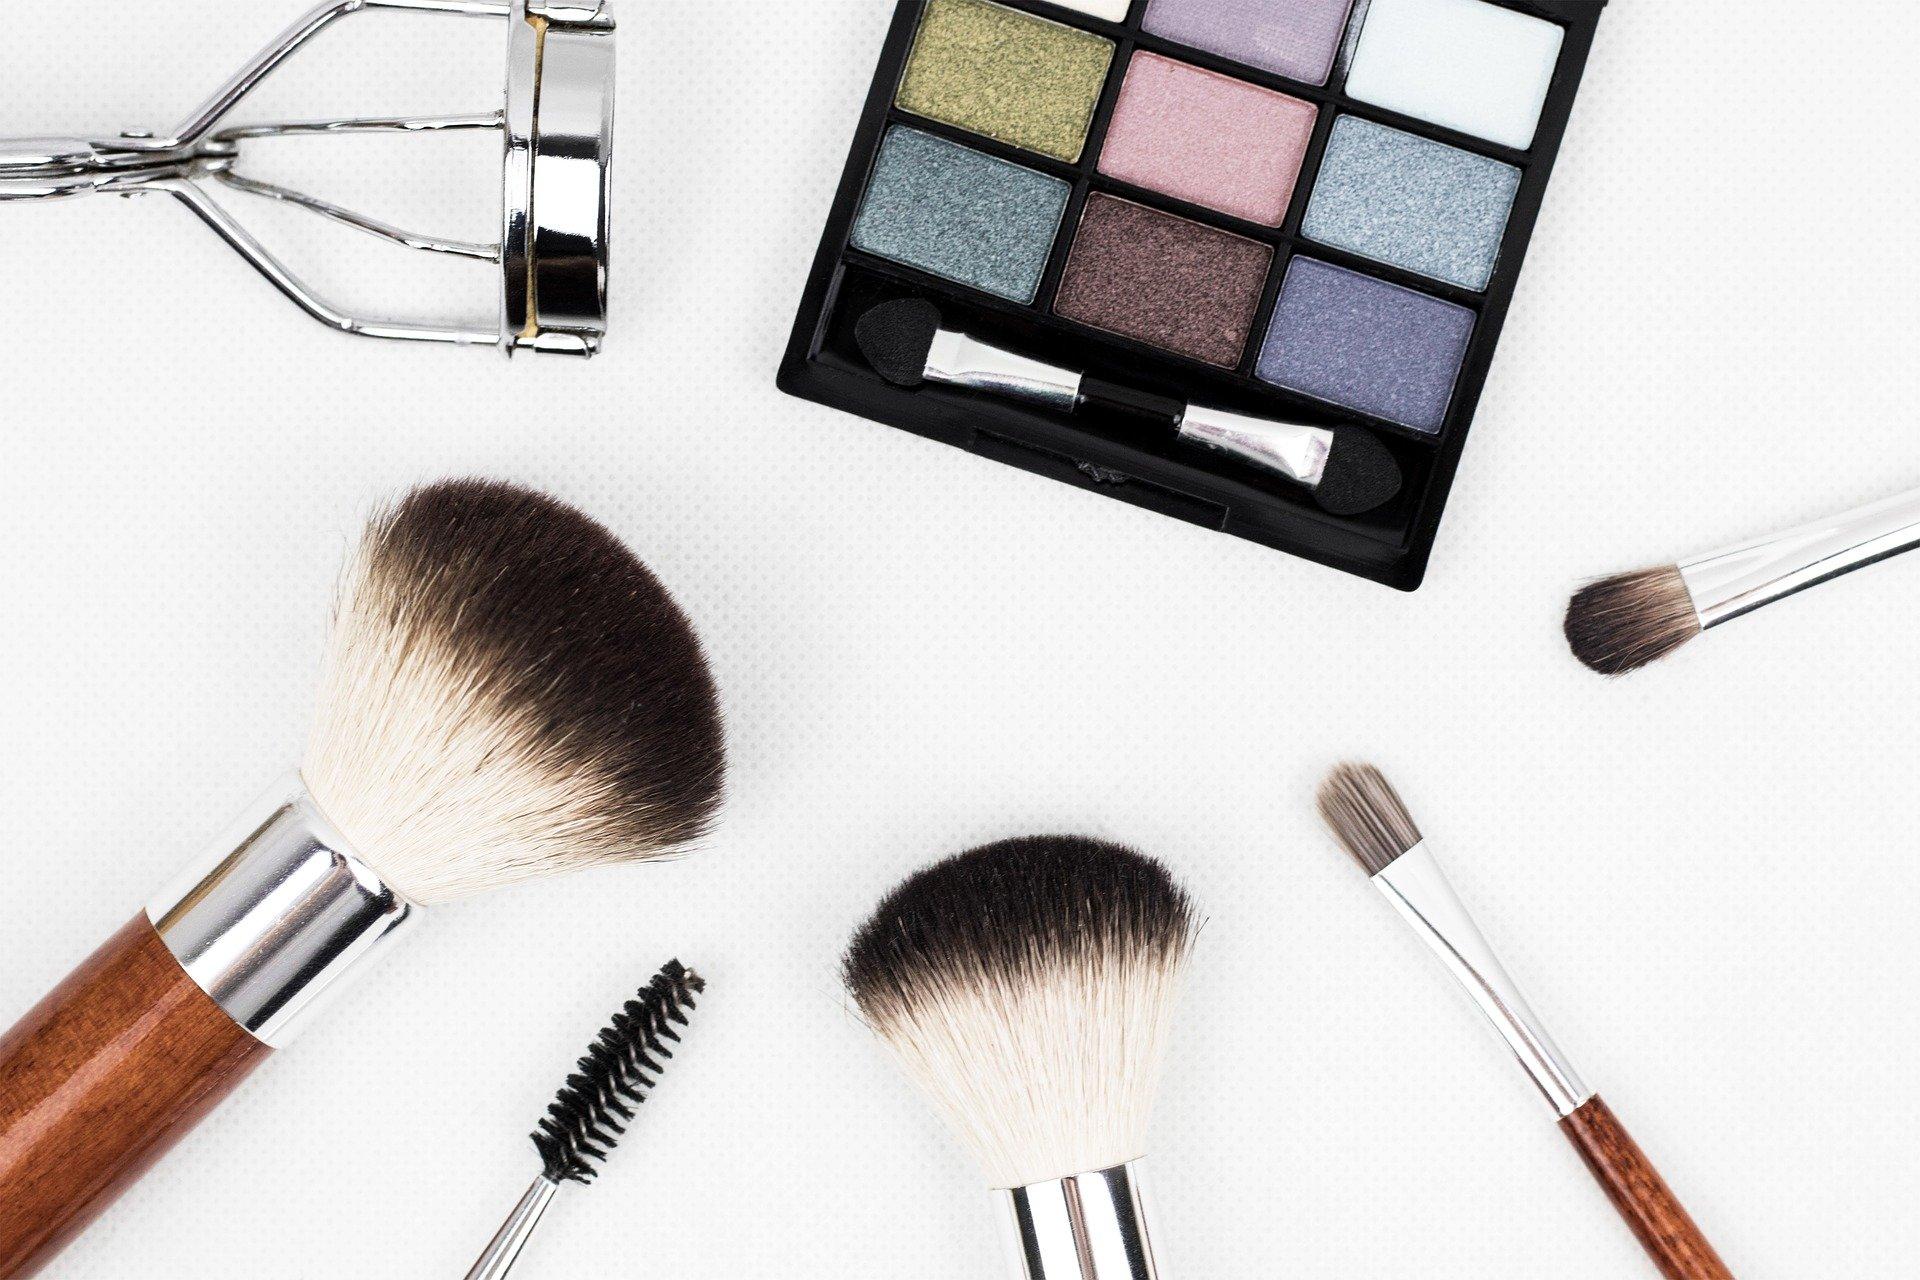 Preparing for Eyelash Extensions